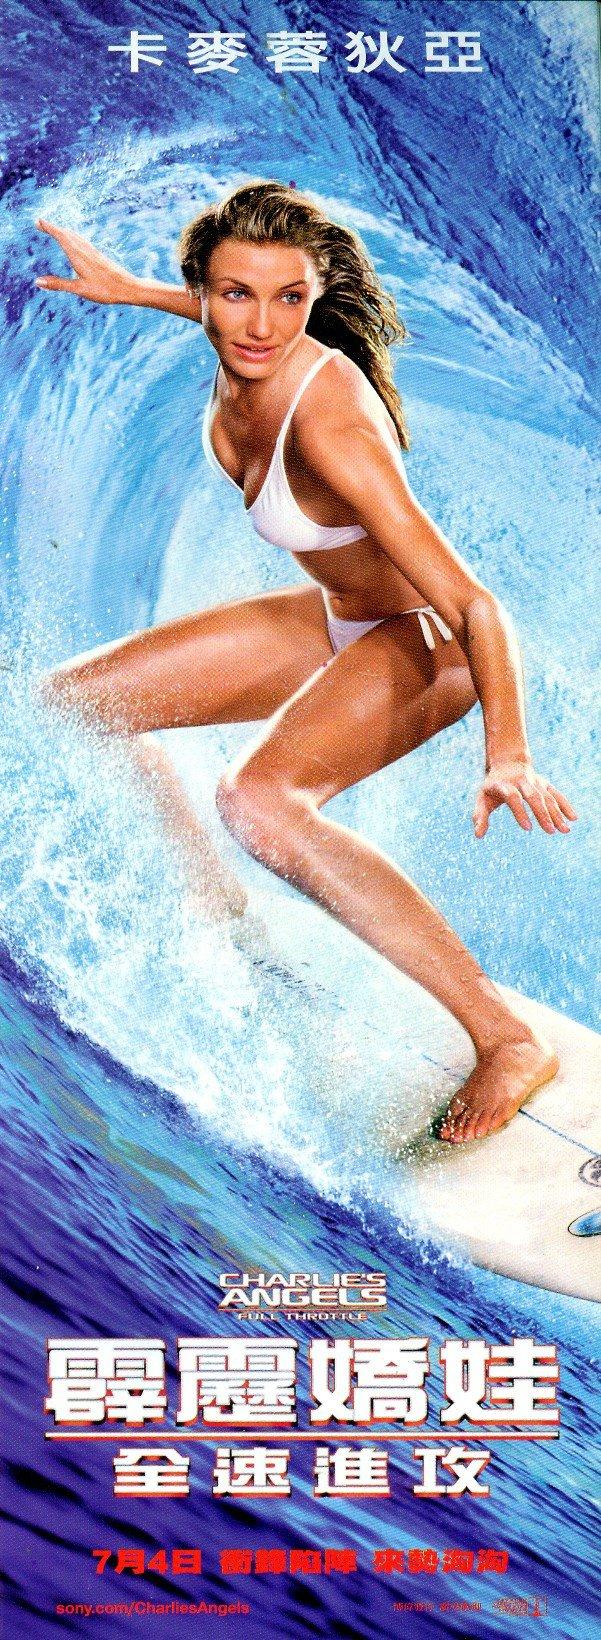 плакат фильма характер-постер Ангелы Чарли 2: Полный вперед